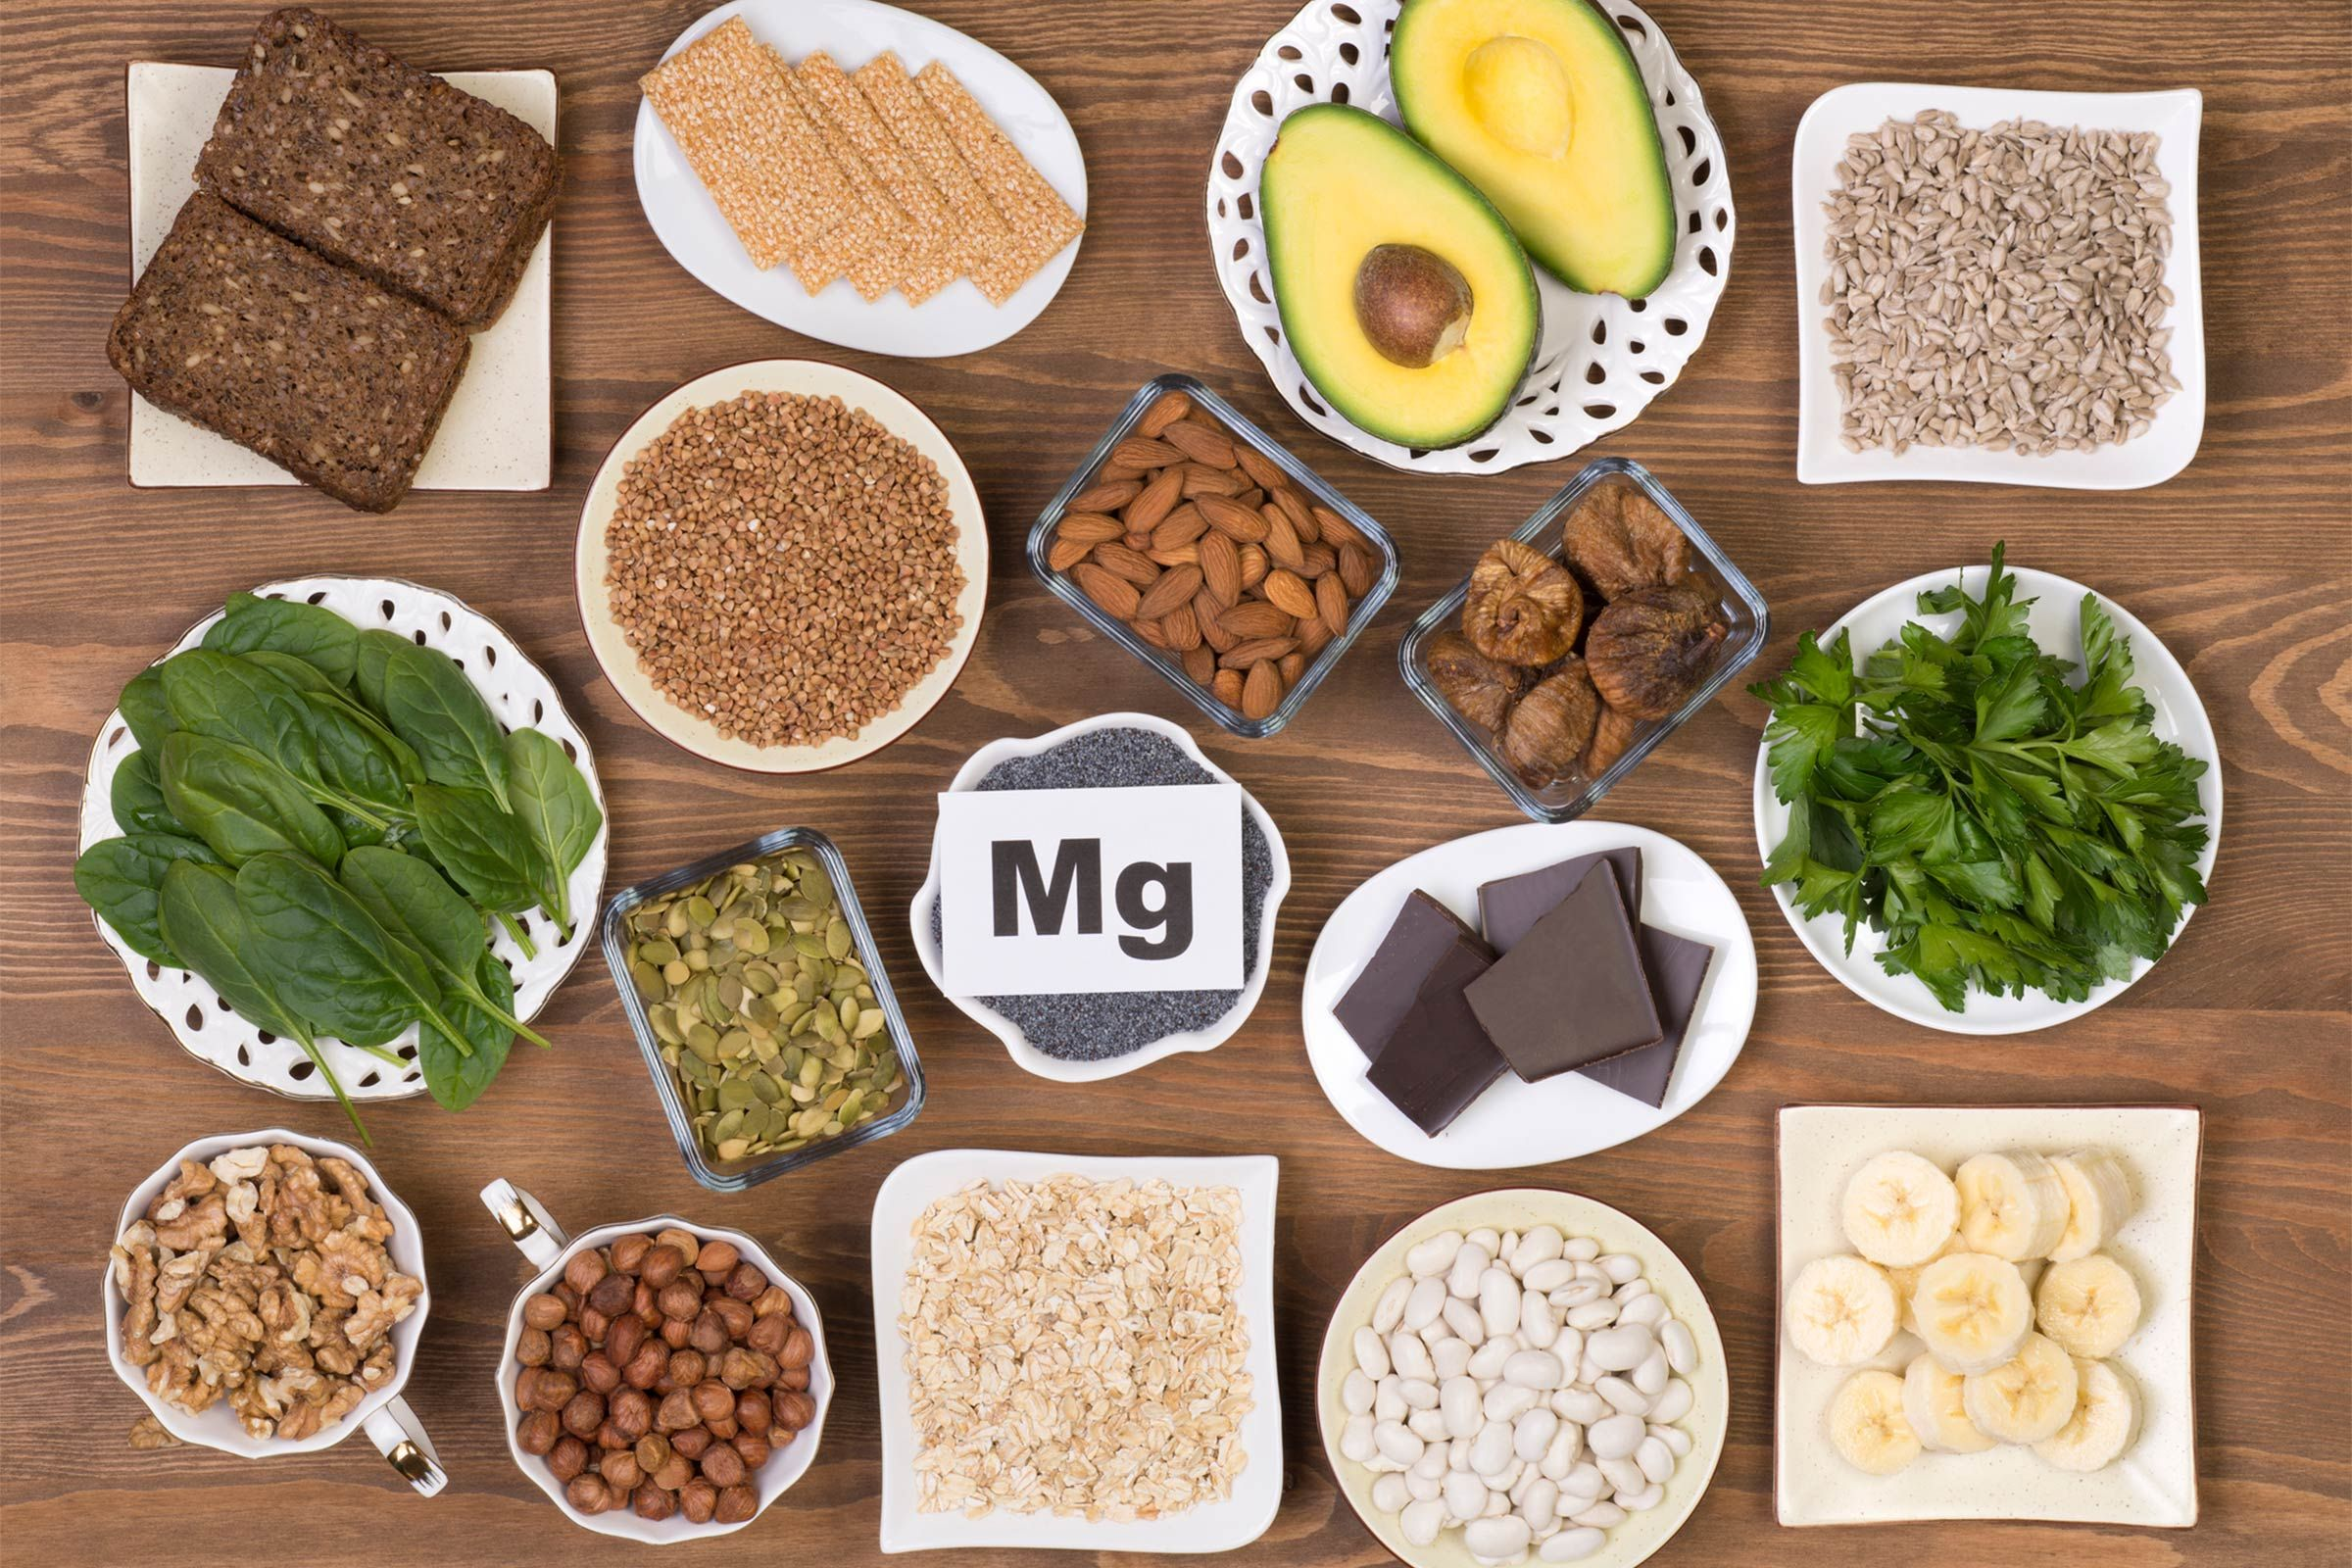 Kết quả hình ảnh cho каких продуктах содержится магний